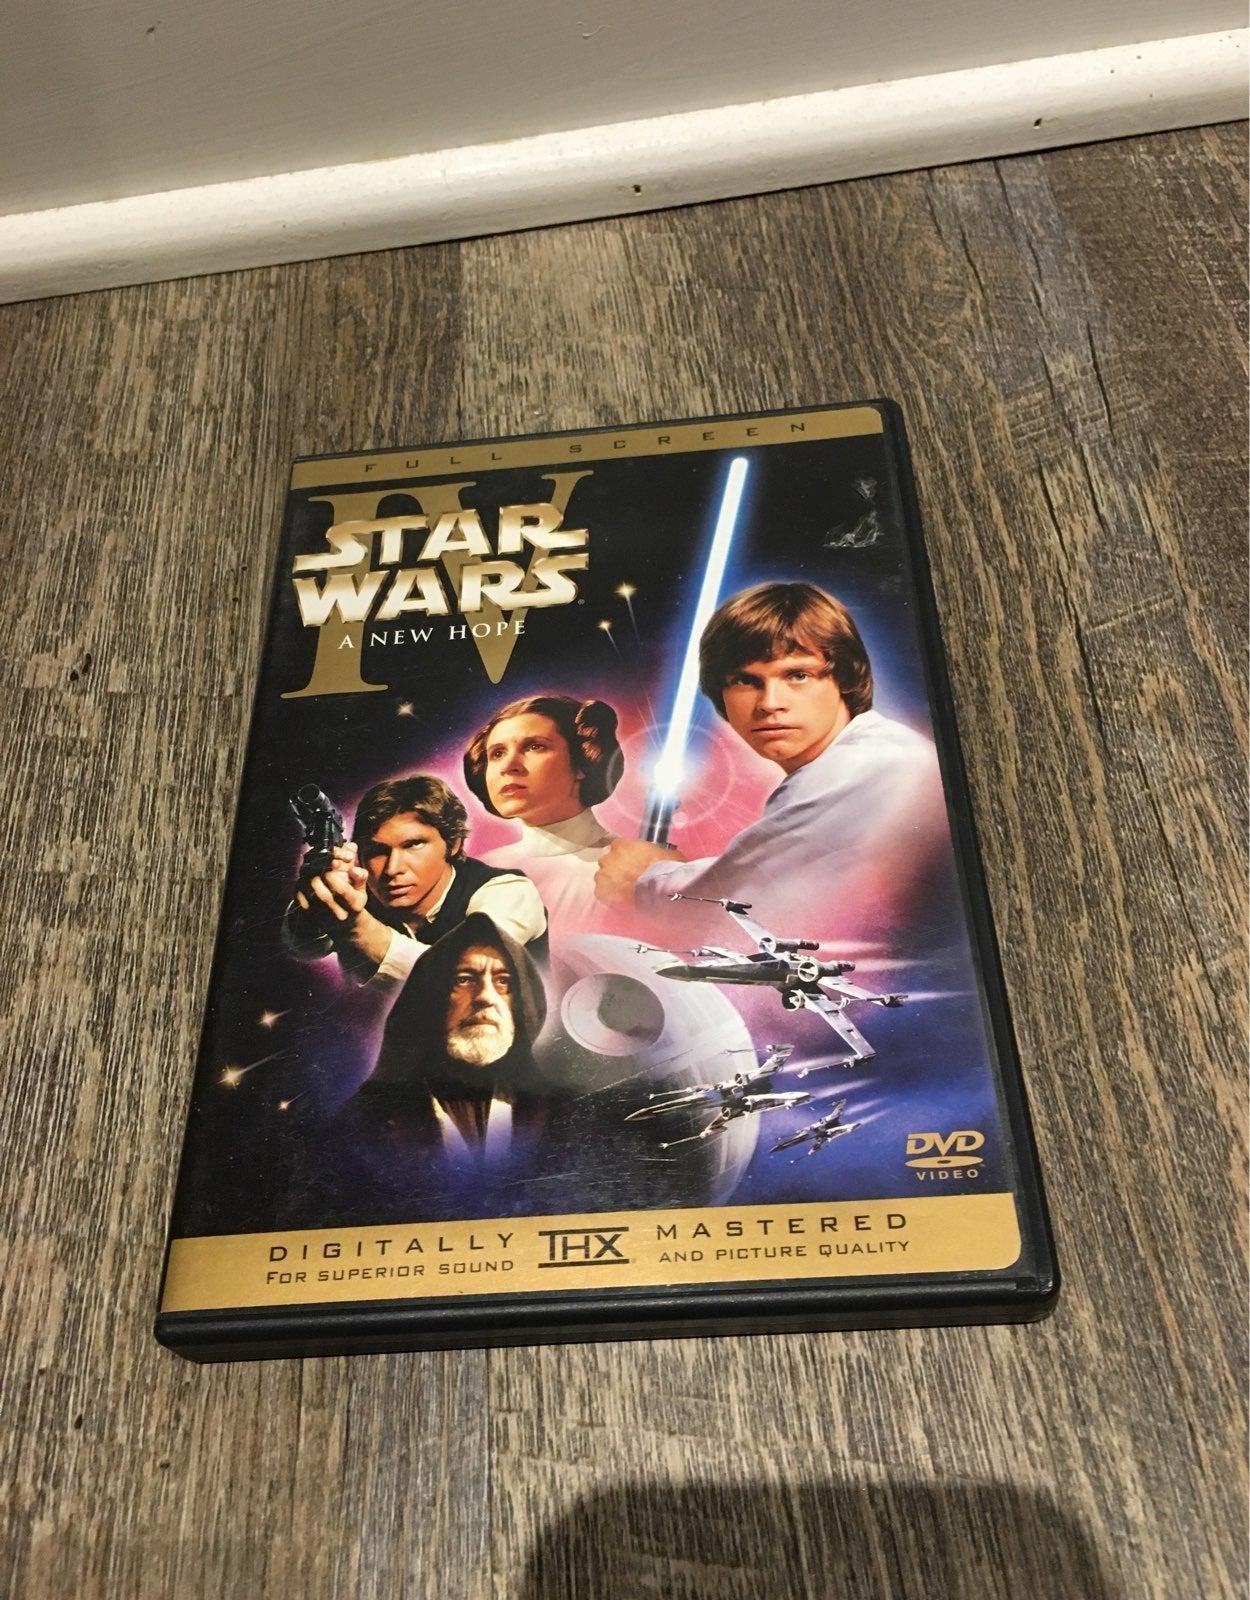 Star wars a new hope dvd